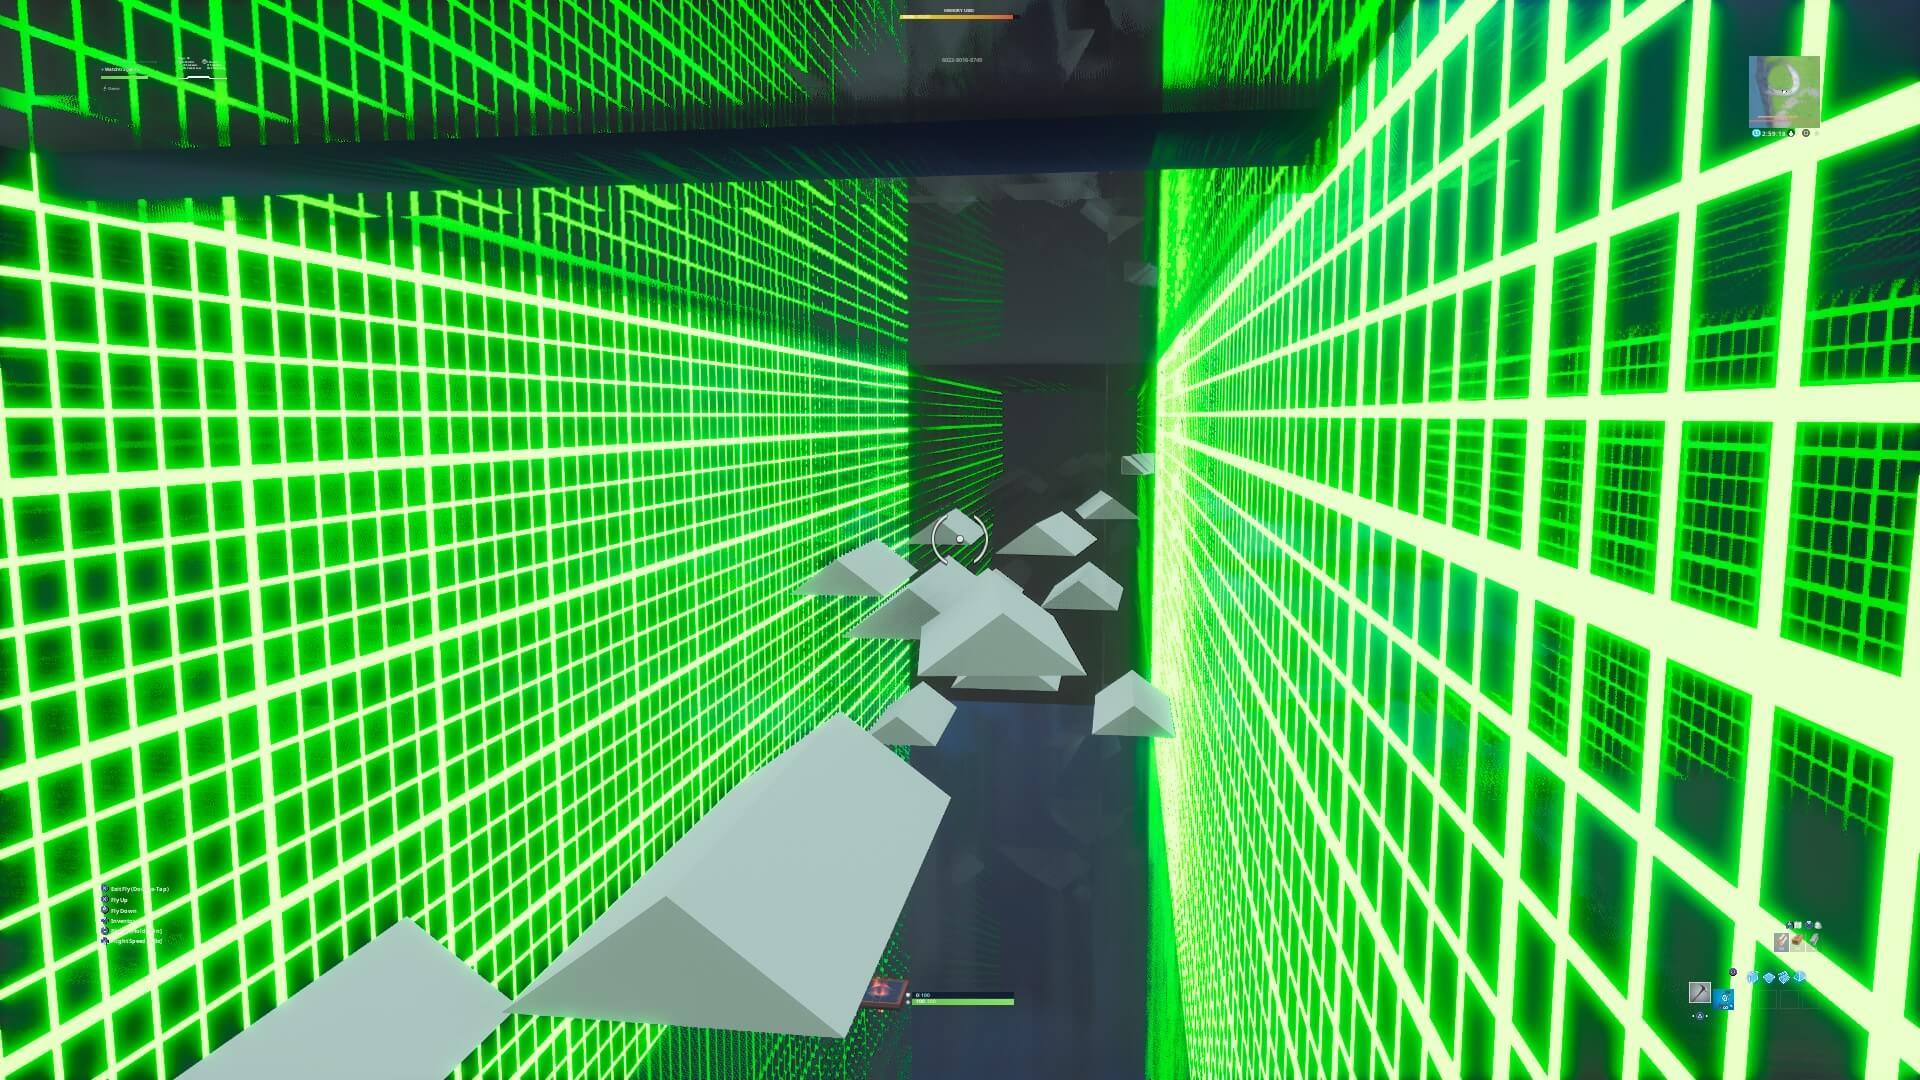 Dropper Code Fortnite Nate S Rainbow Dropper Fortnite Creative Mini Games And Fun Map Code